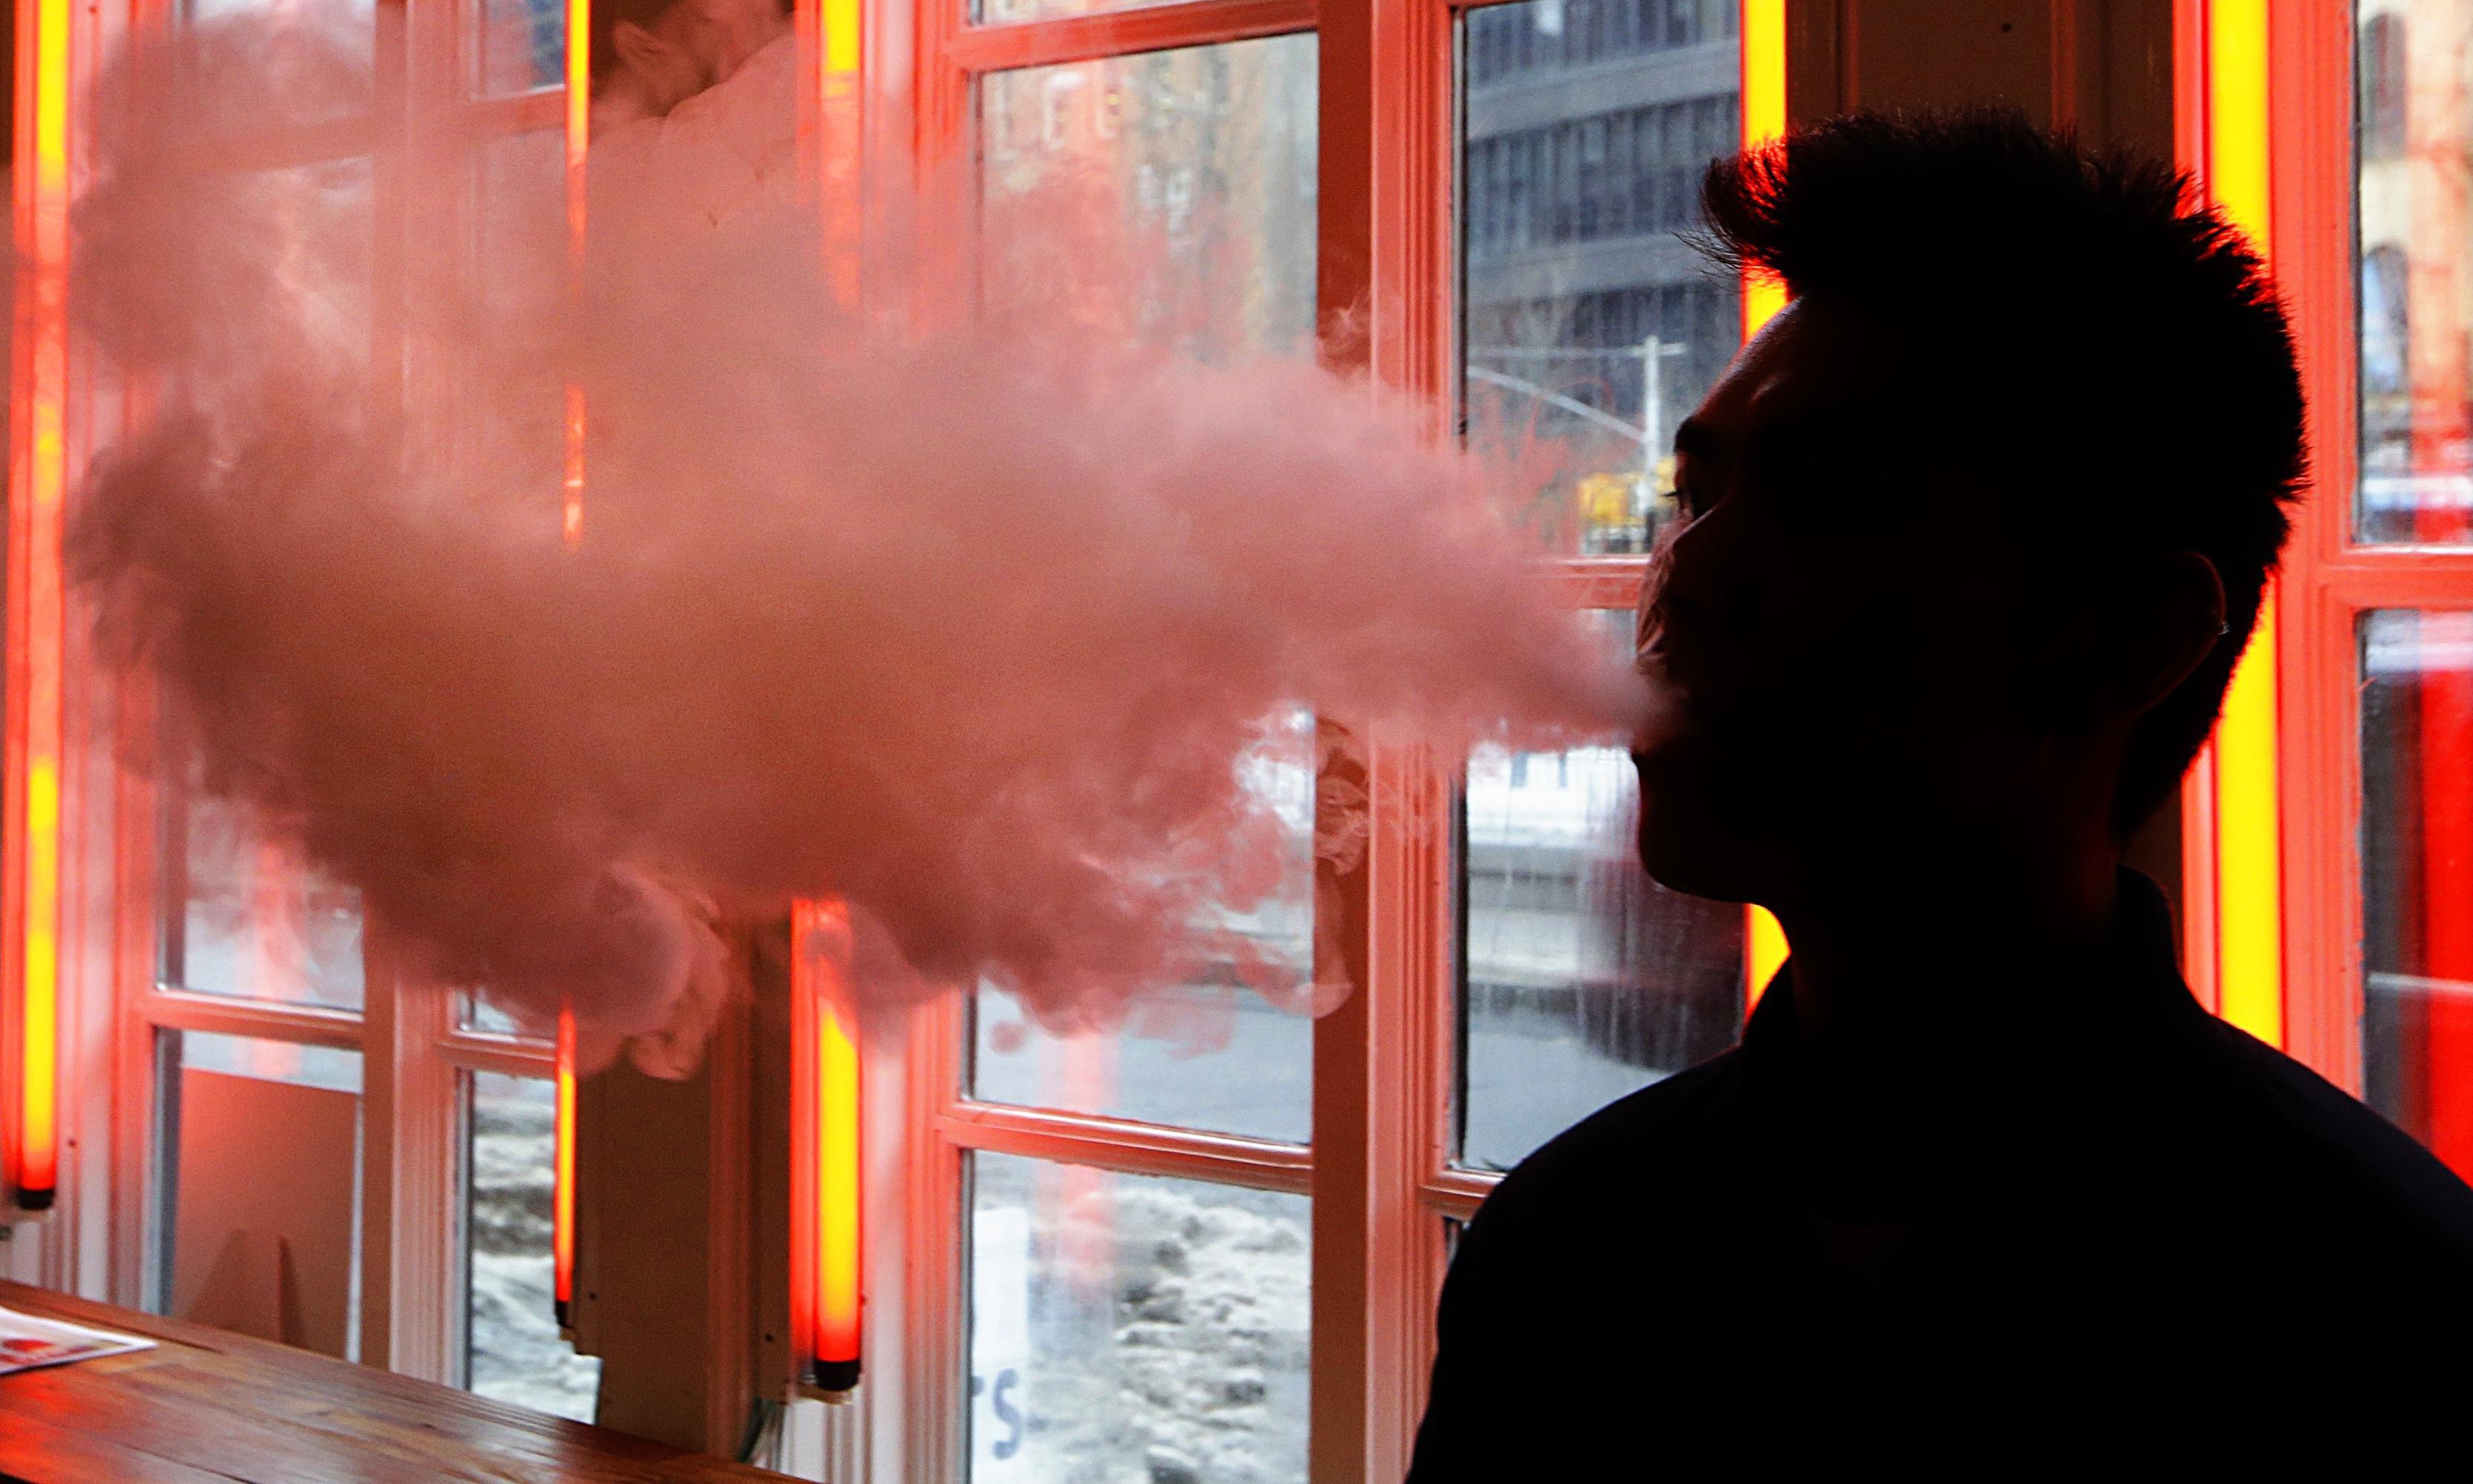 Australian health authorities on high alert after US vaping deaths